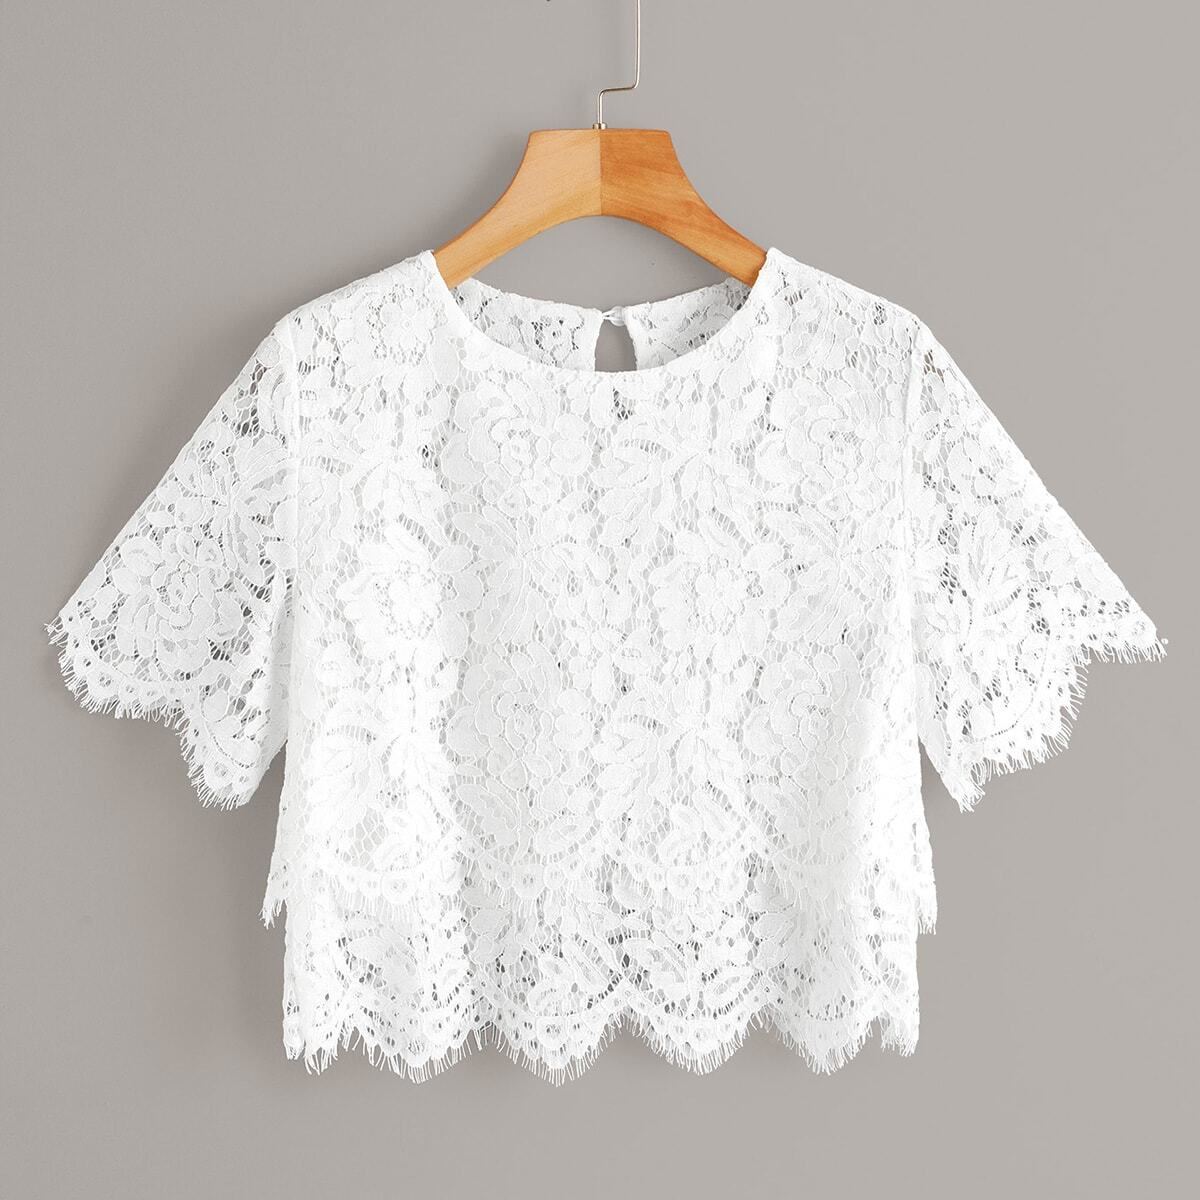 SHEIN coupon: Lace Scallop Hem Sheer Crop Blouse